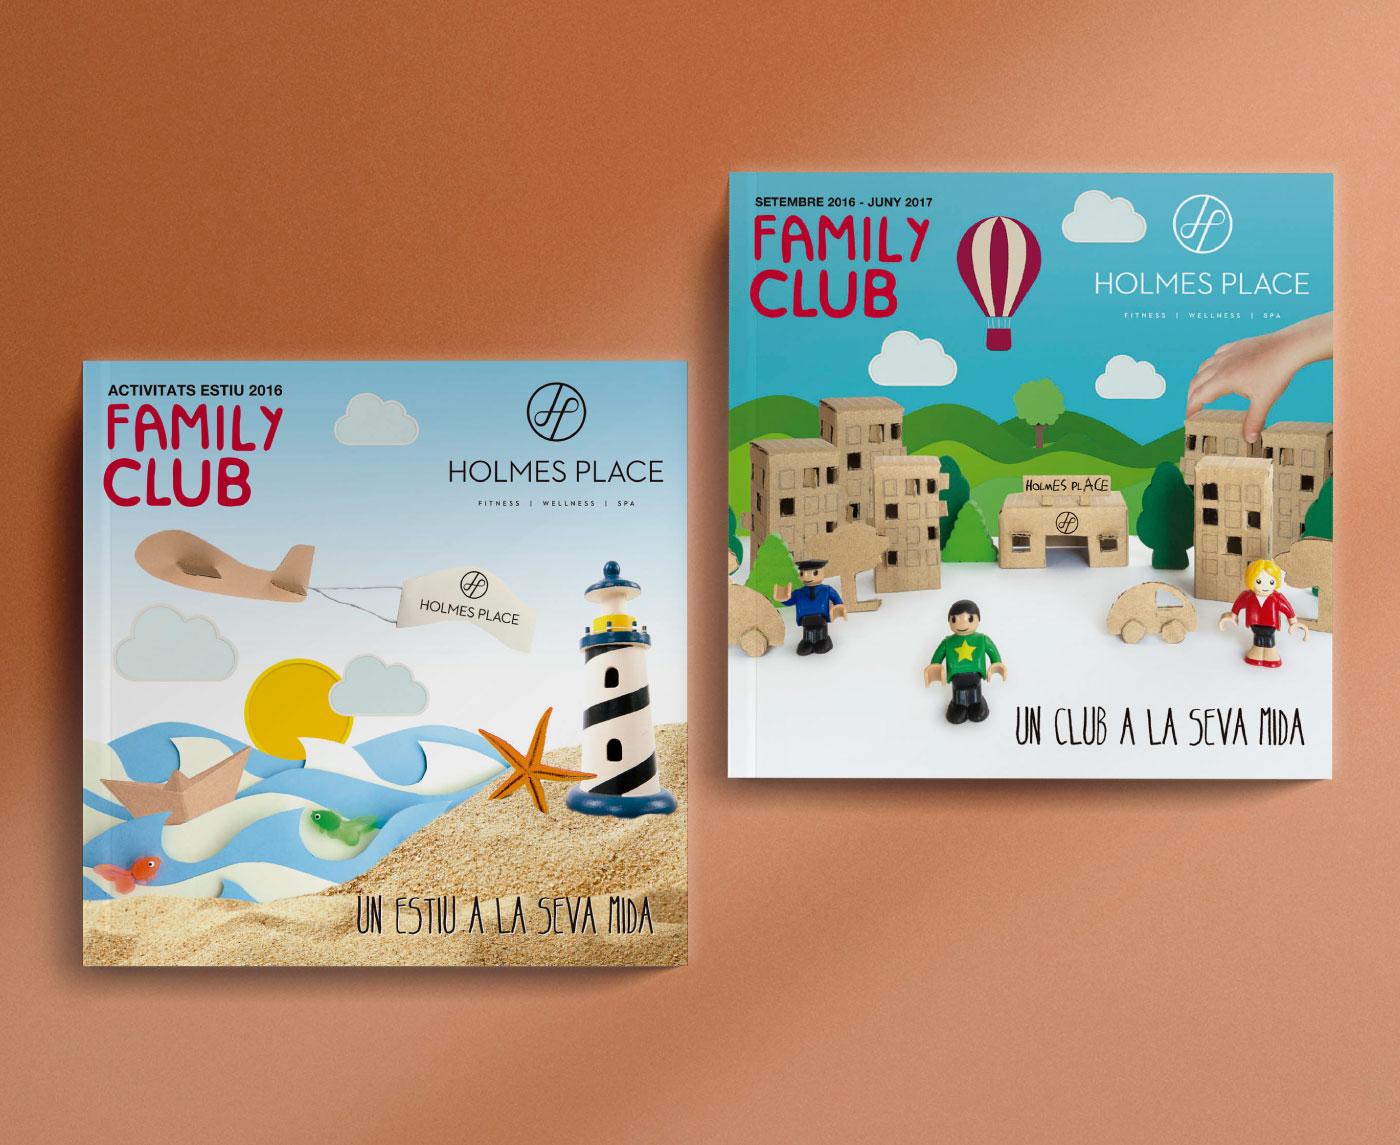 Diseño portadas folleto Family Club de Holmes Place